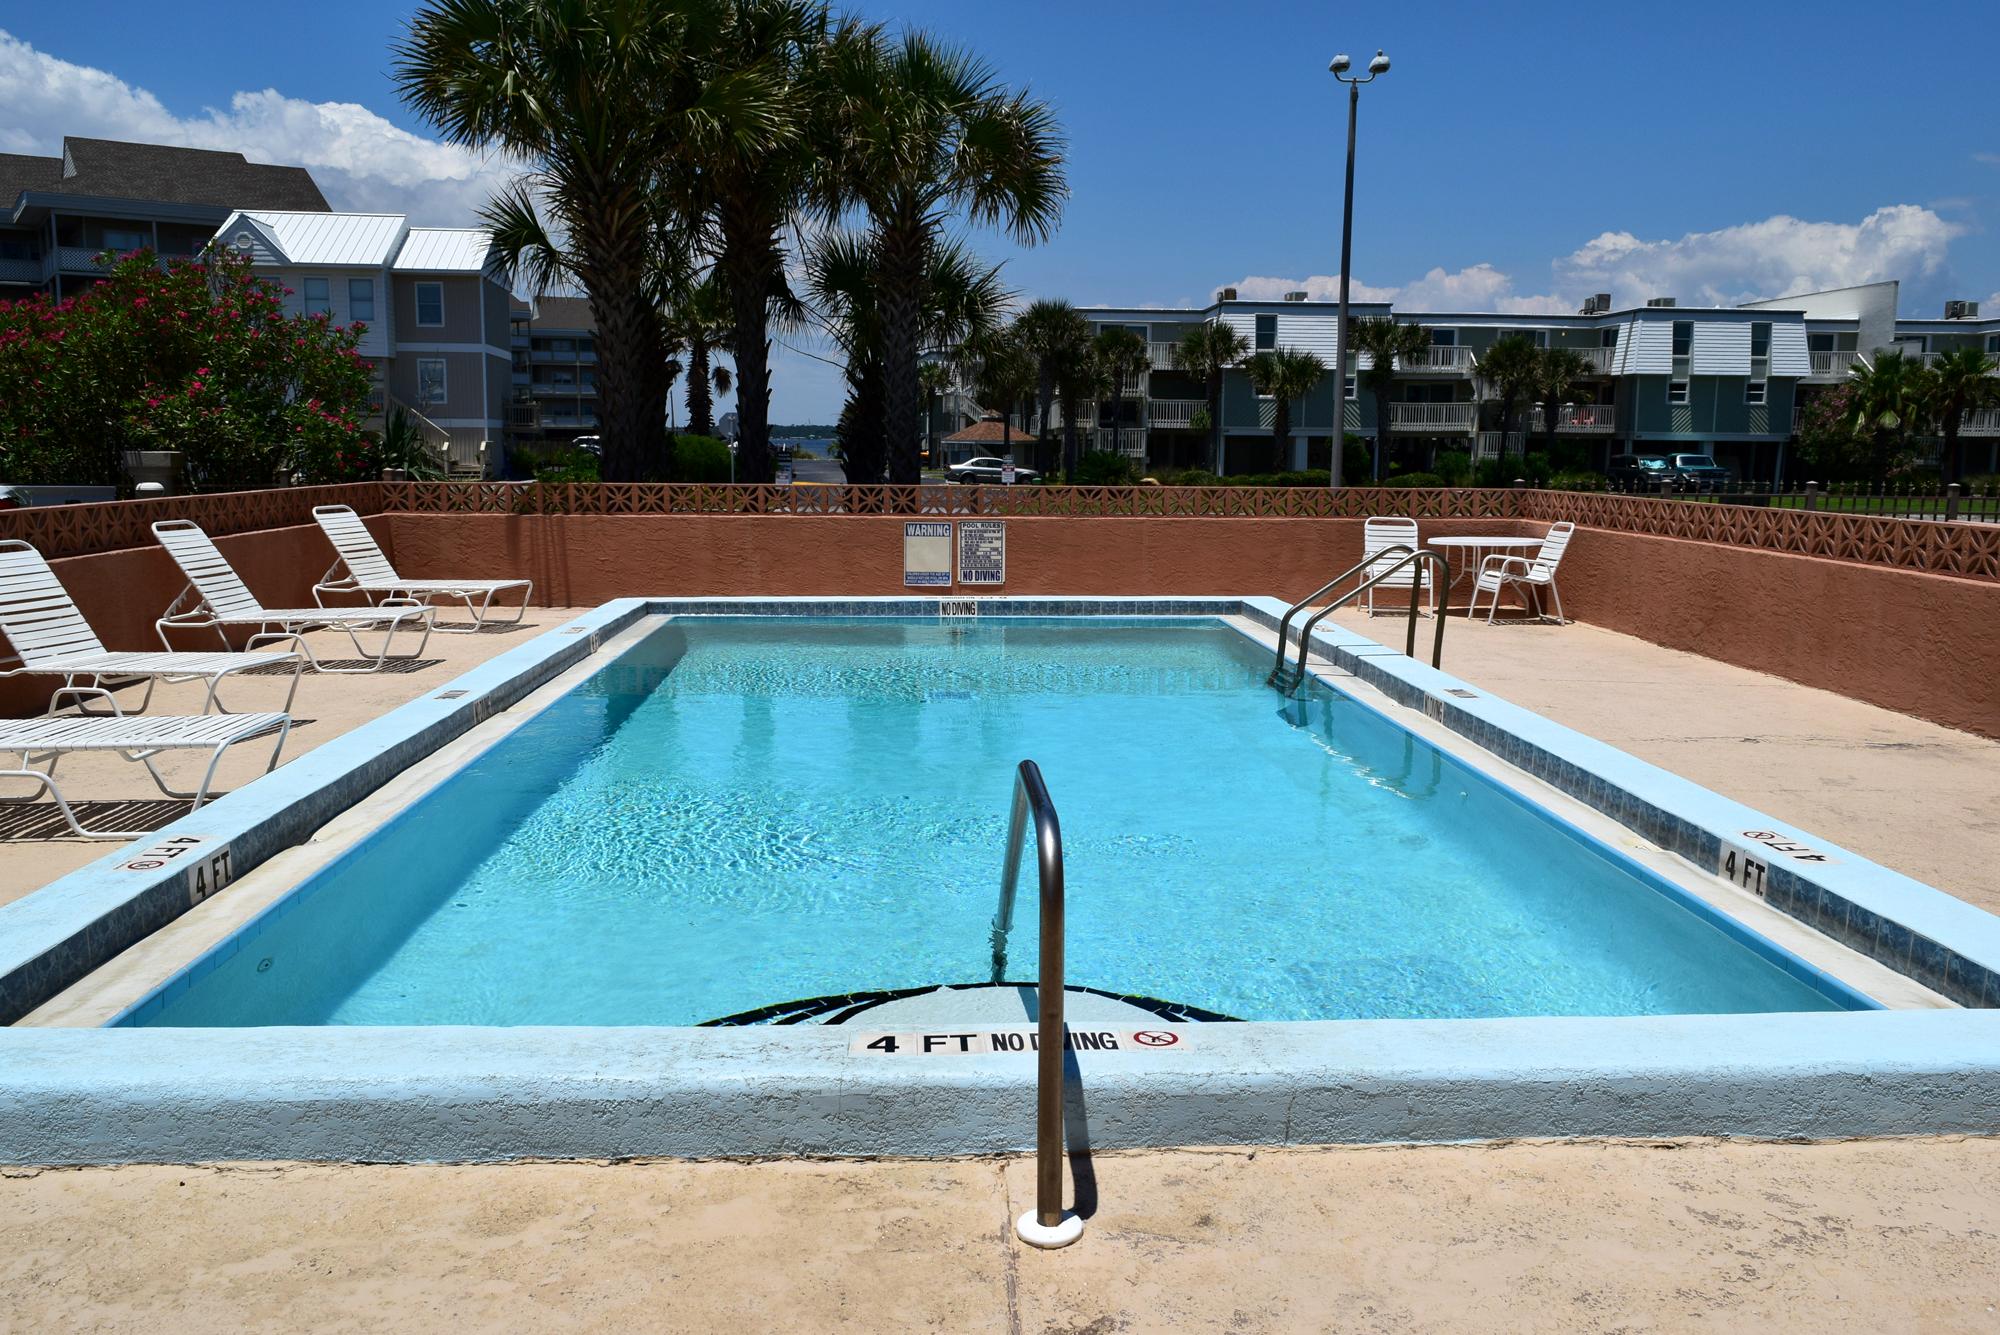 Gulf Winds #404 Condo rental in Gulf Winds Pensacola ~ Pensacola Beach Vacation Rentals by BeachGuide in Pensacola Beach Florida - #24